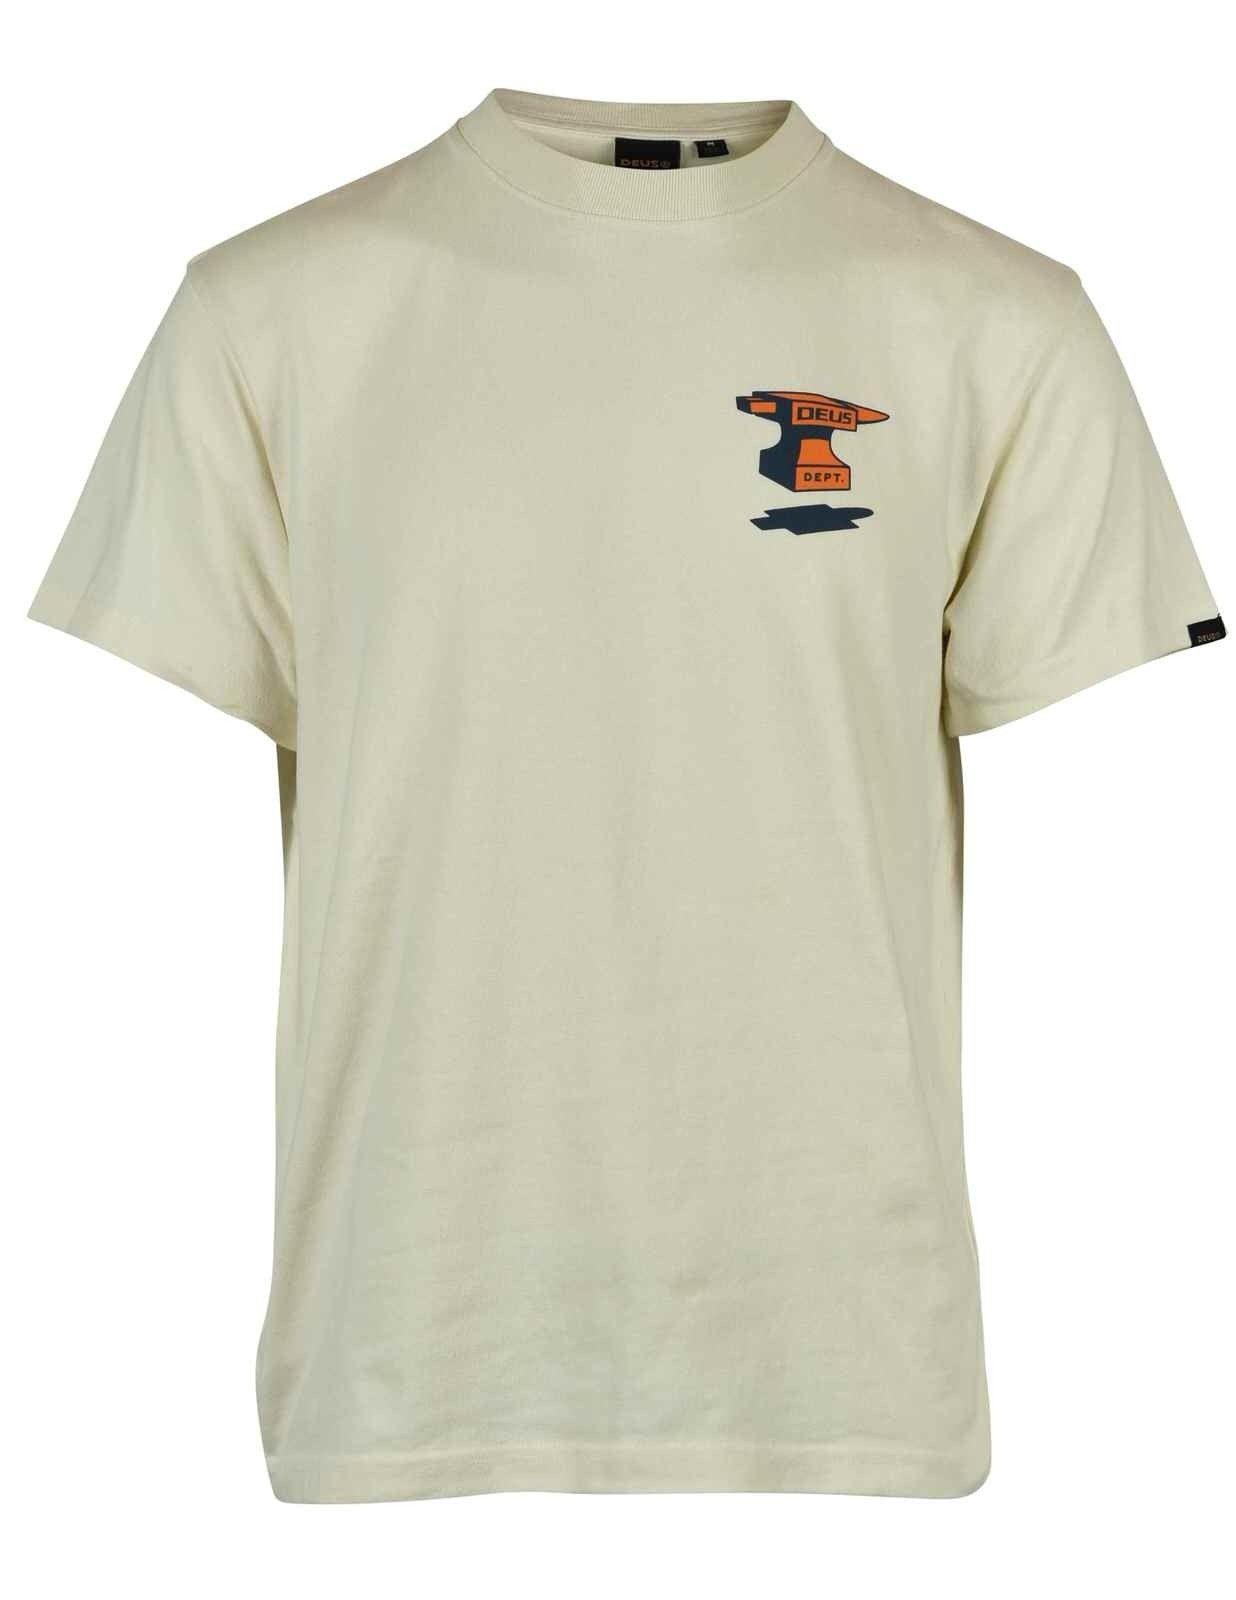 DEUS EX MACHINA - Herren T-Shirt - Physics Tee - Vintage White